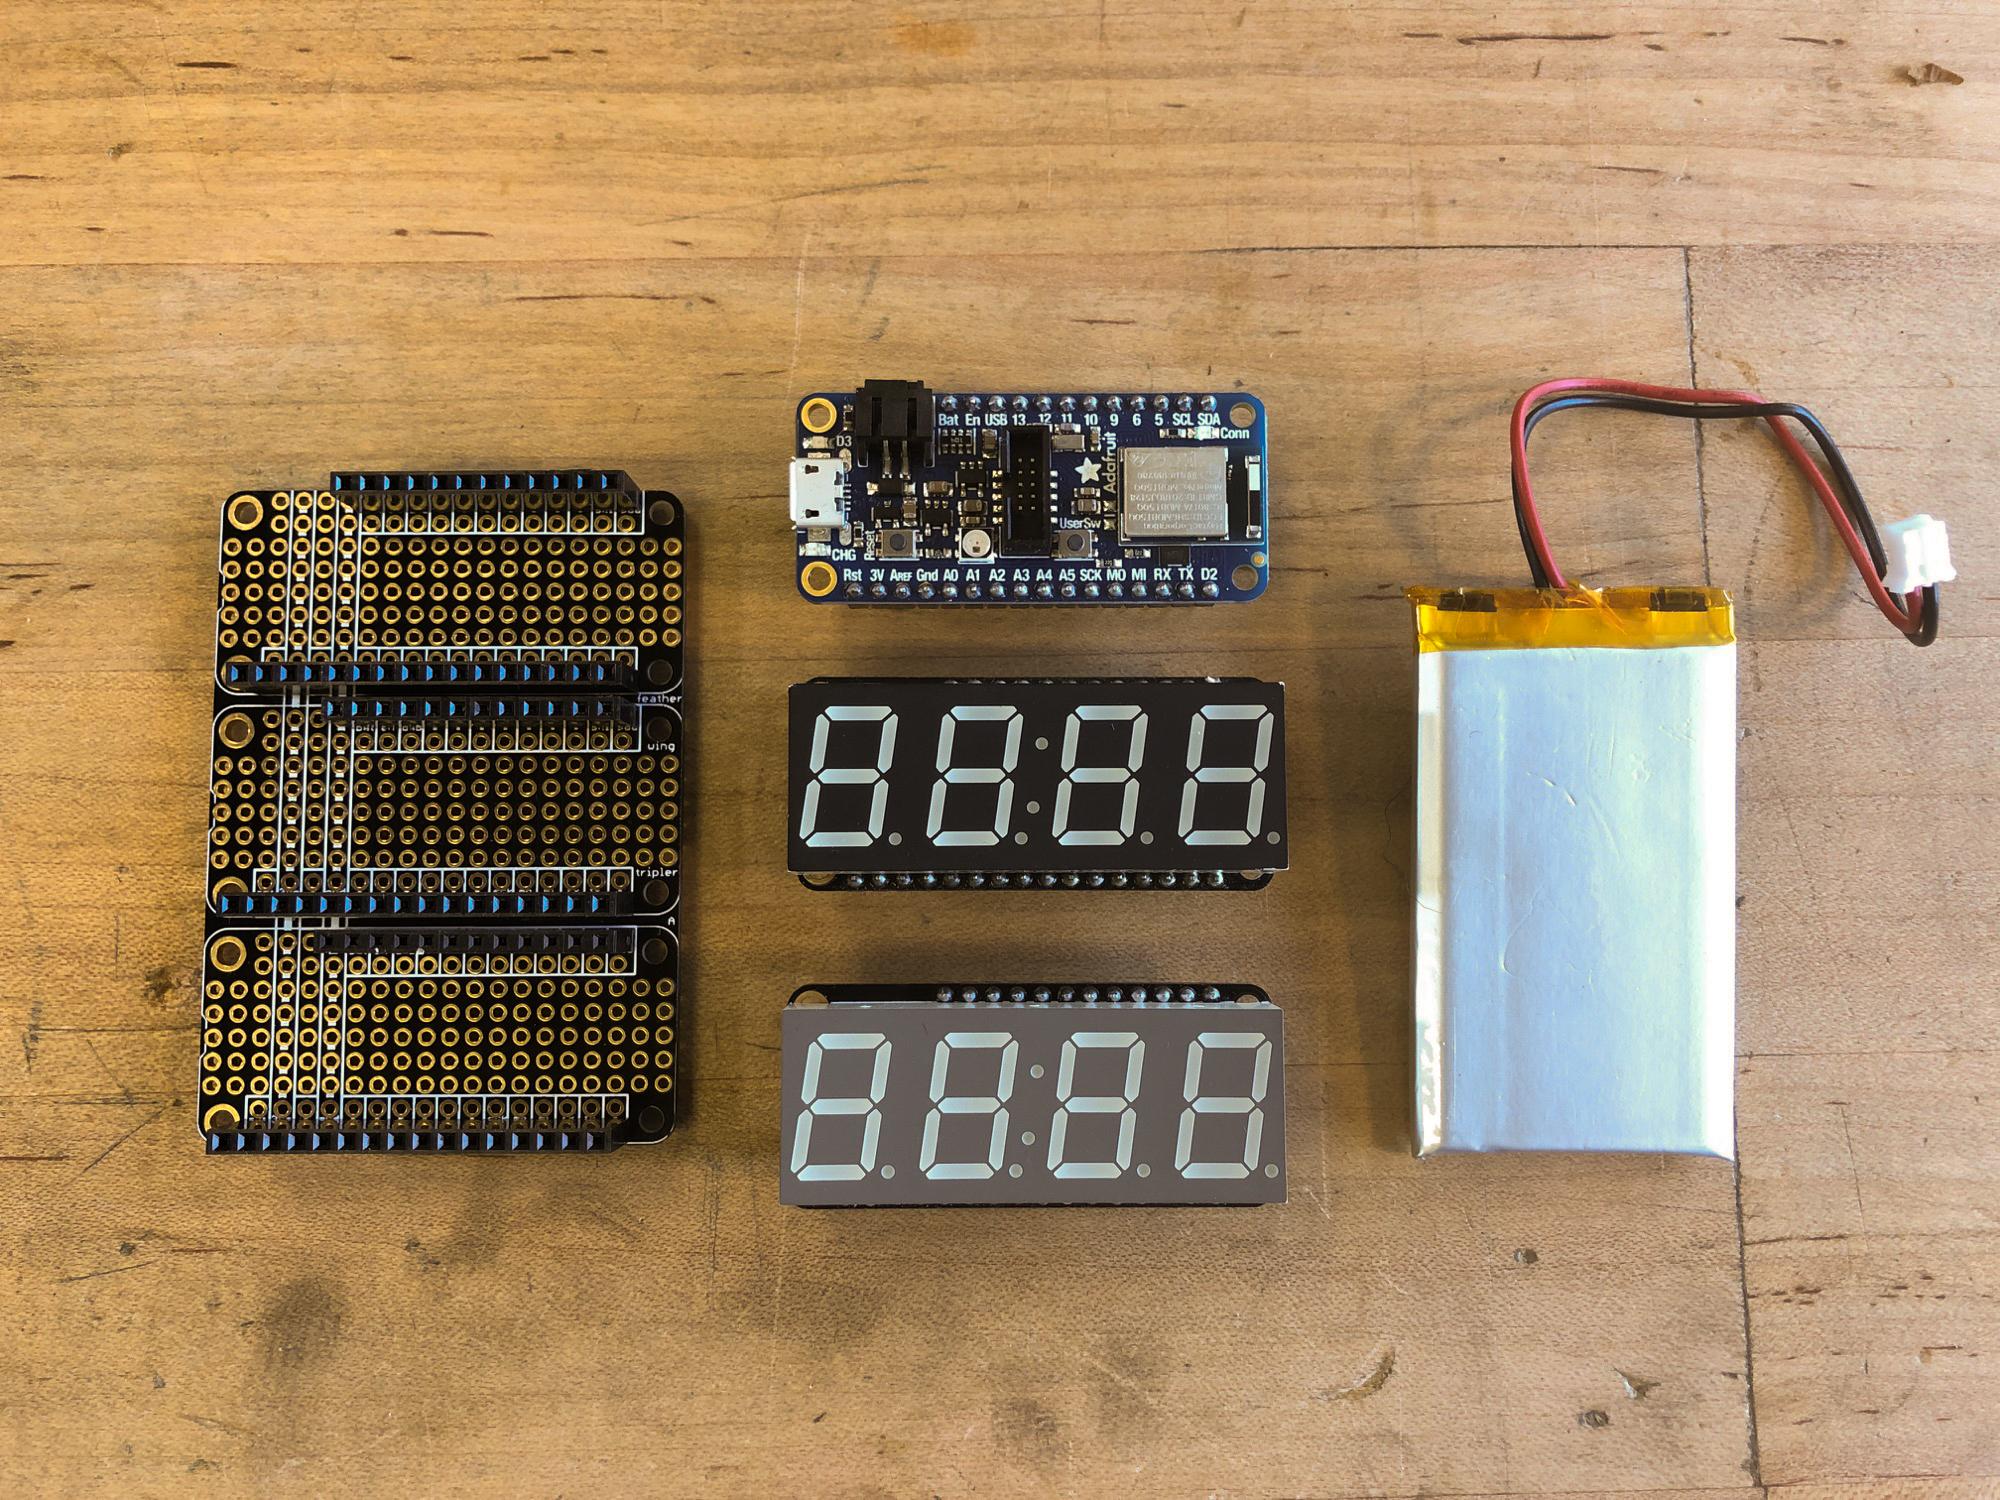 circuitpython_hrt_build_0568_new2k.jpg